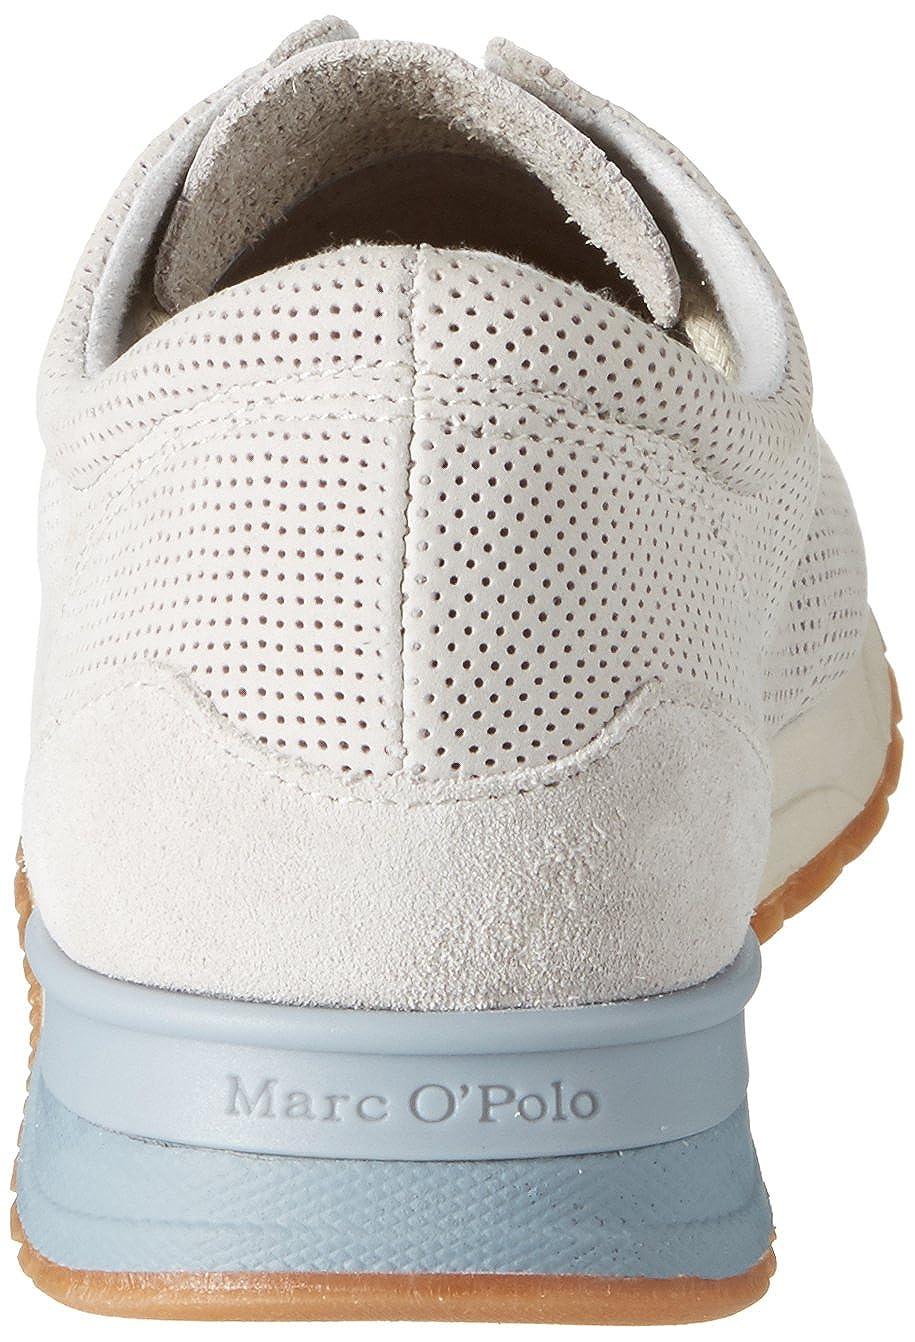 SneakerGraustone36 O'polo 70113893501200 Damen Marc Eu 5qAj3LSc4R